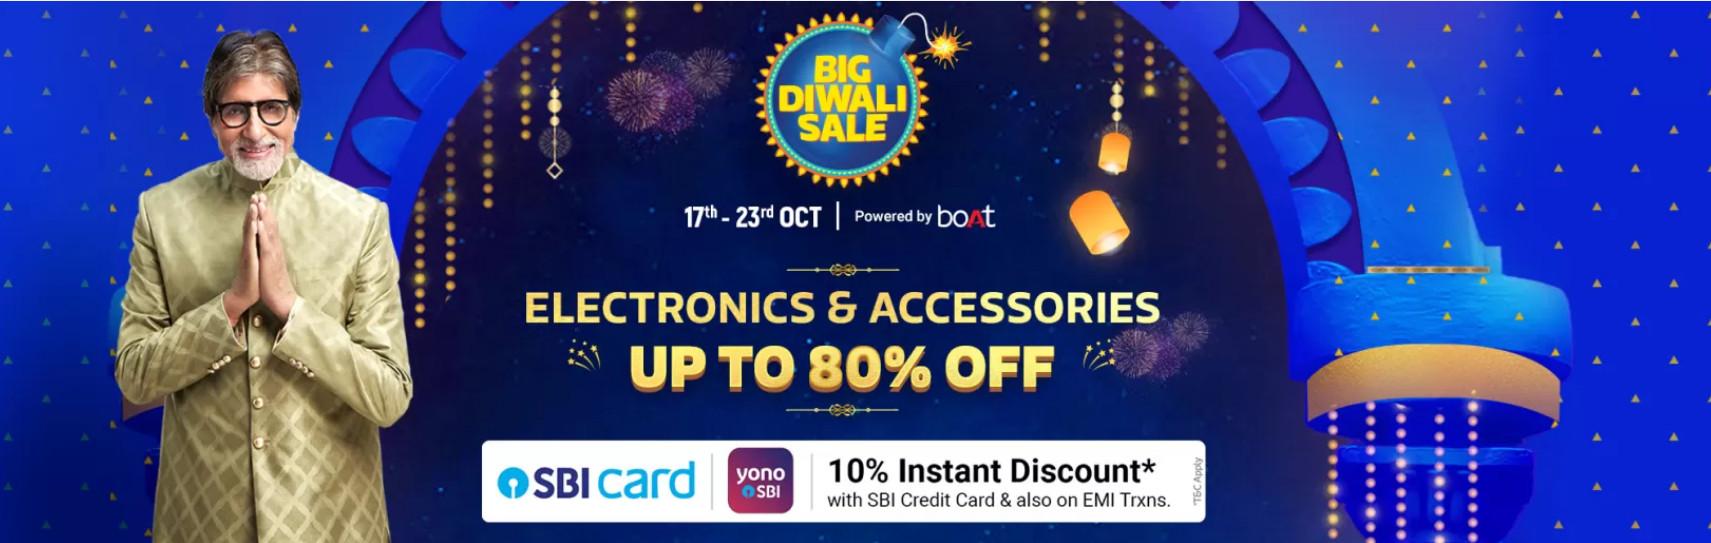 Flipkart Diwali Offers 2021